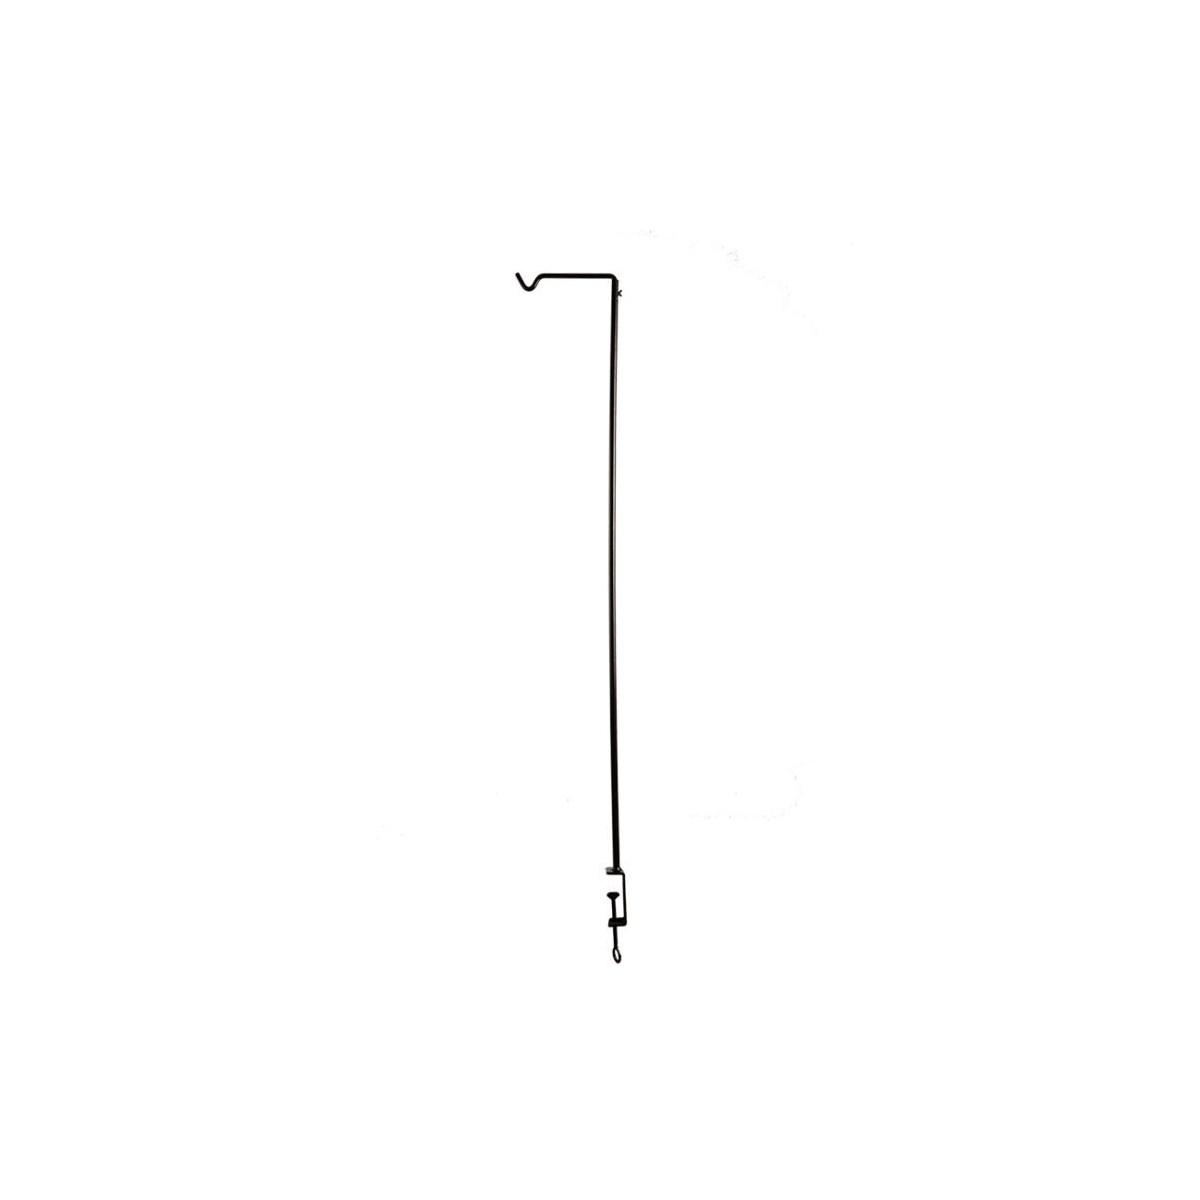 Table hook